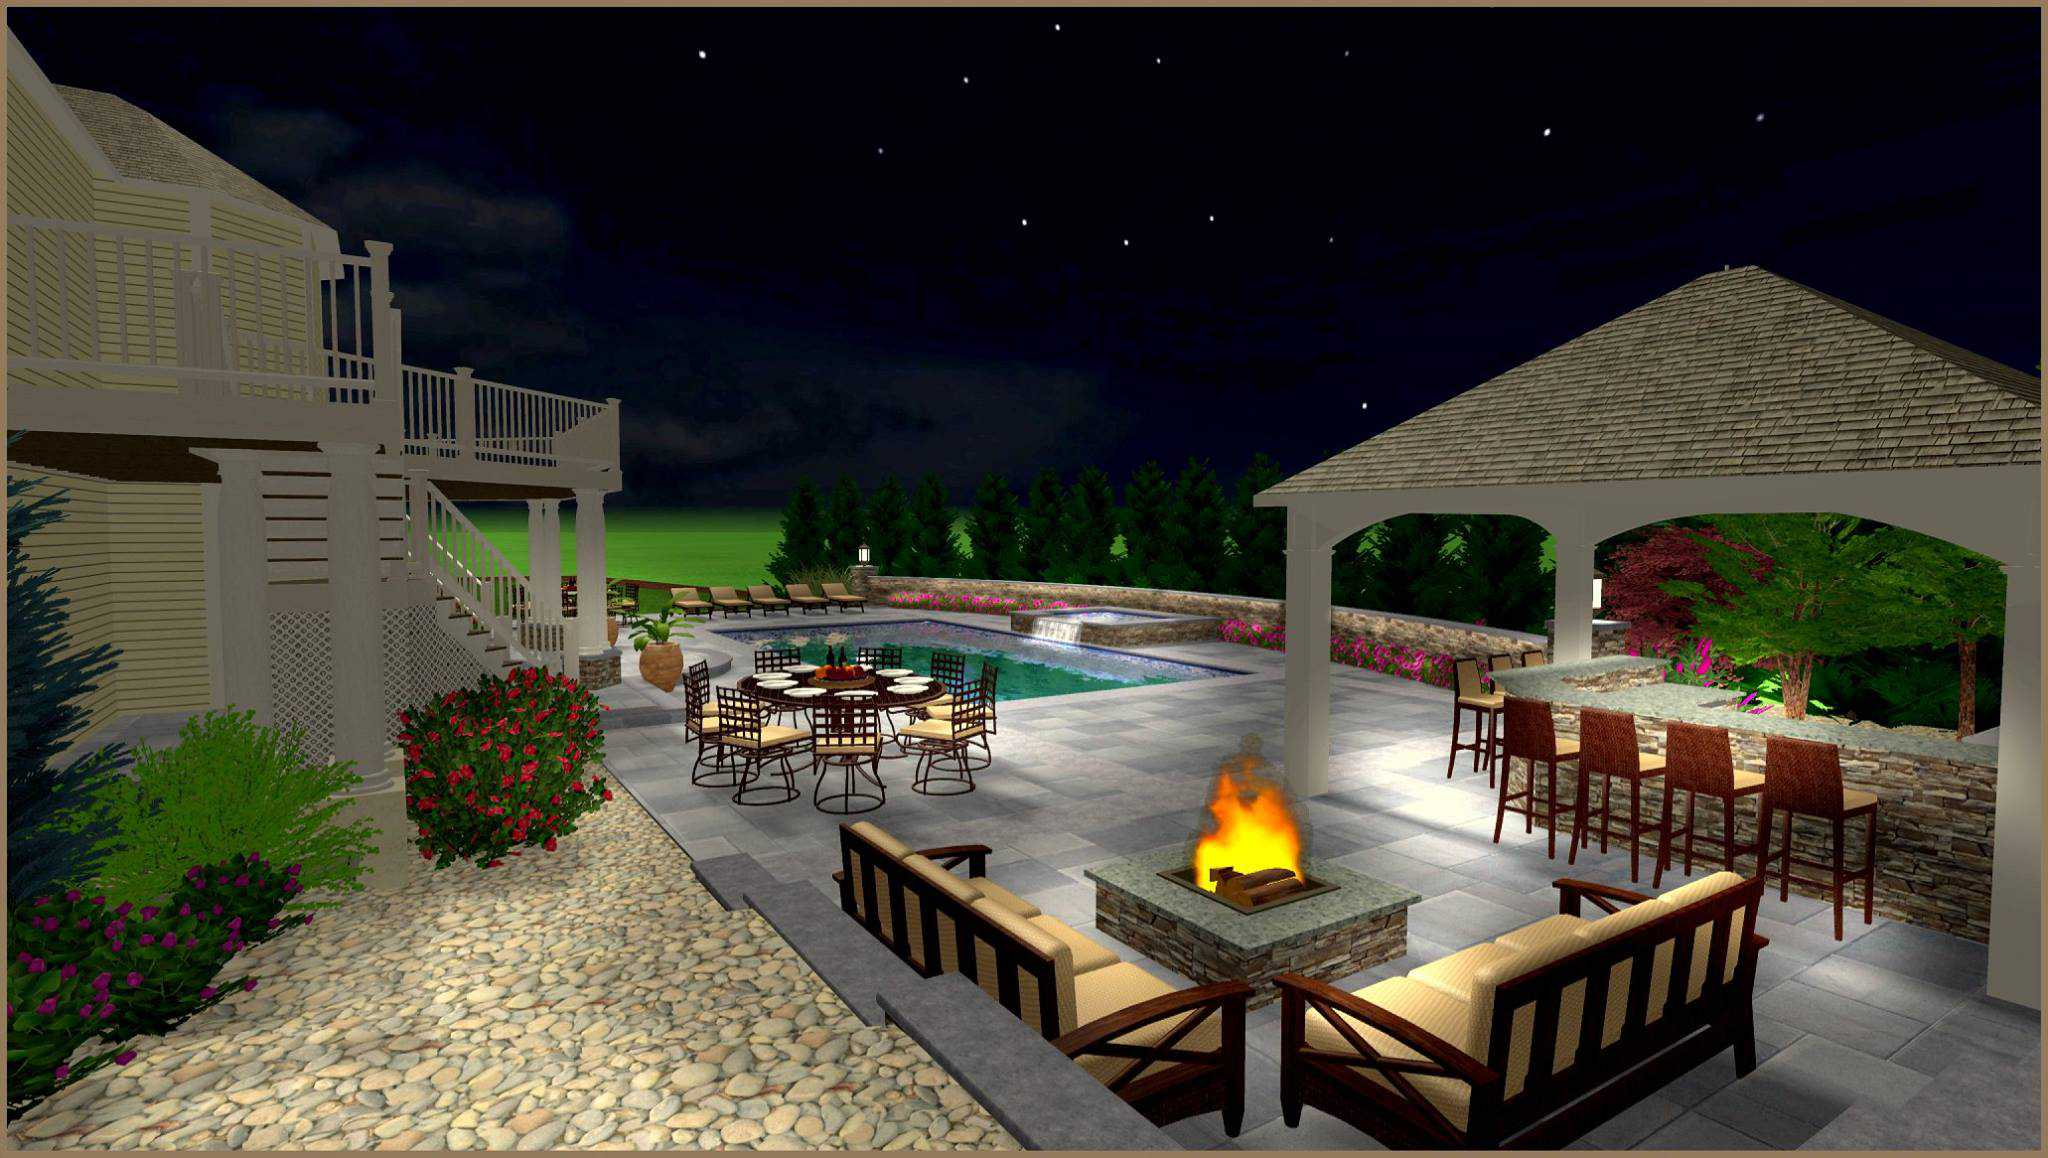 Design Renderings For Backyard Oasis